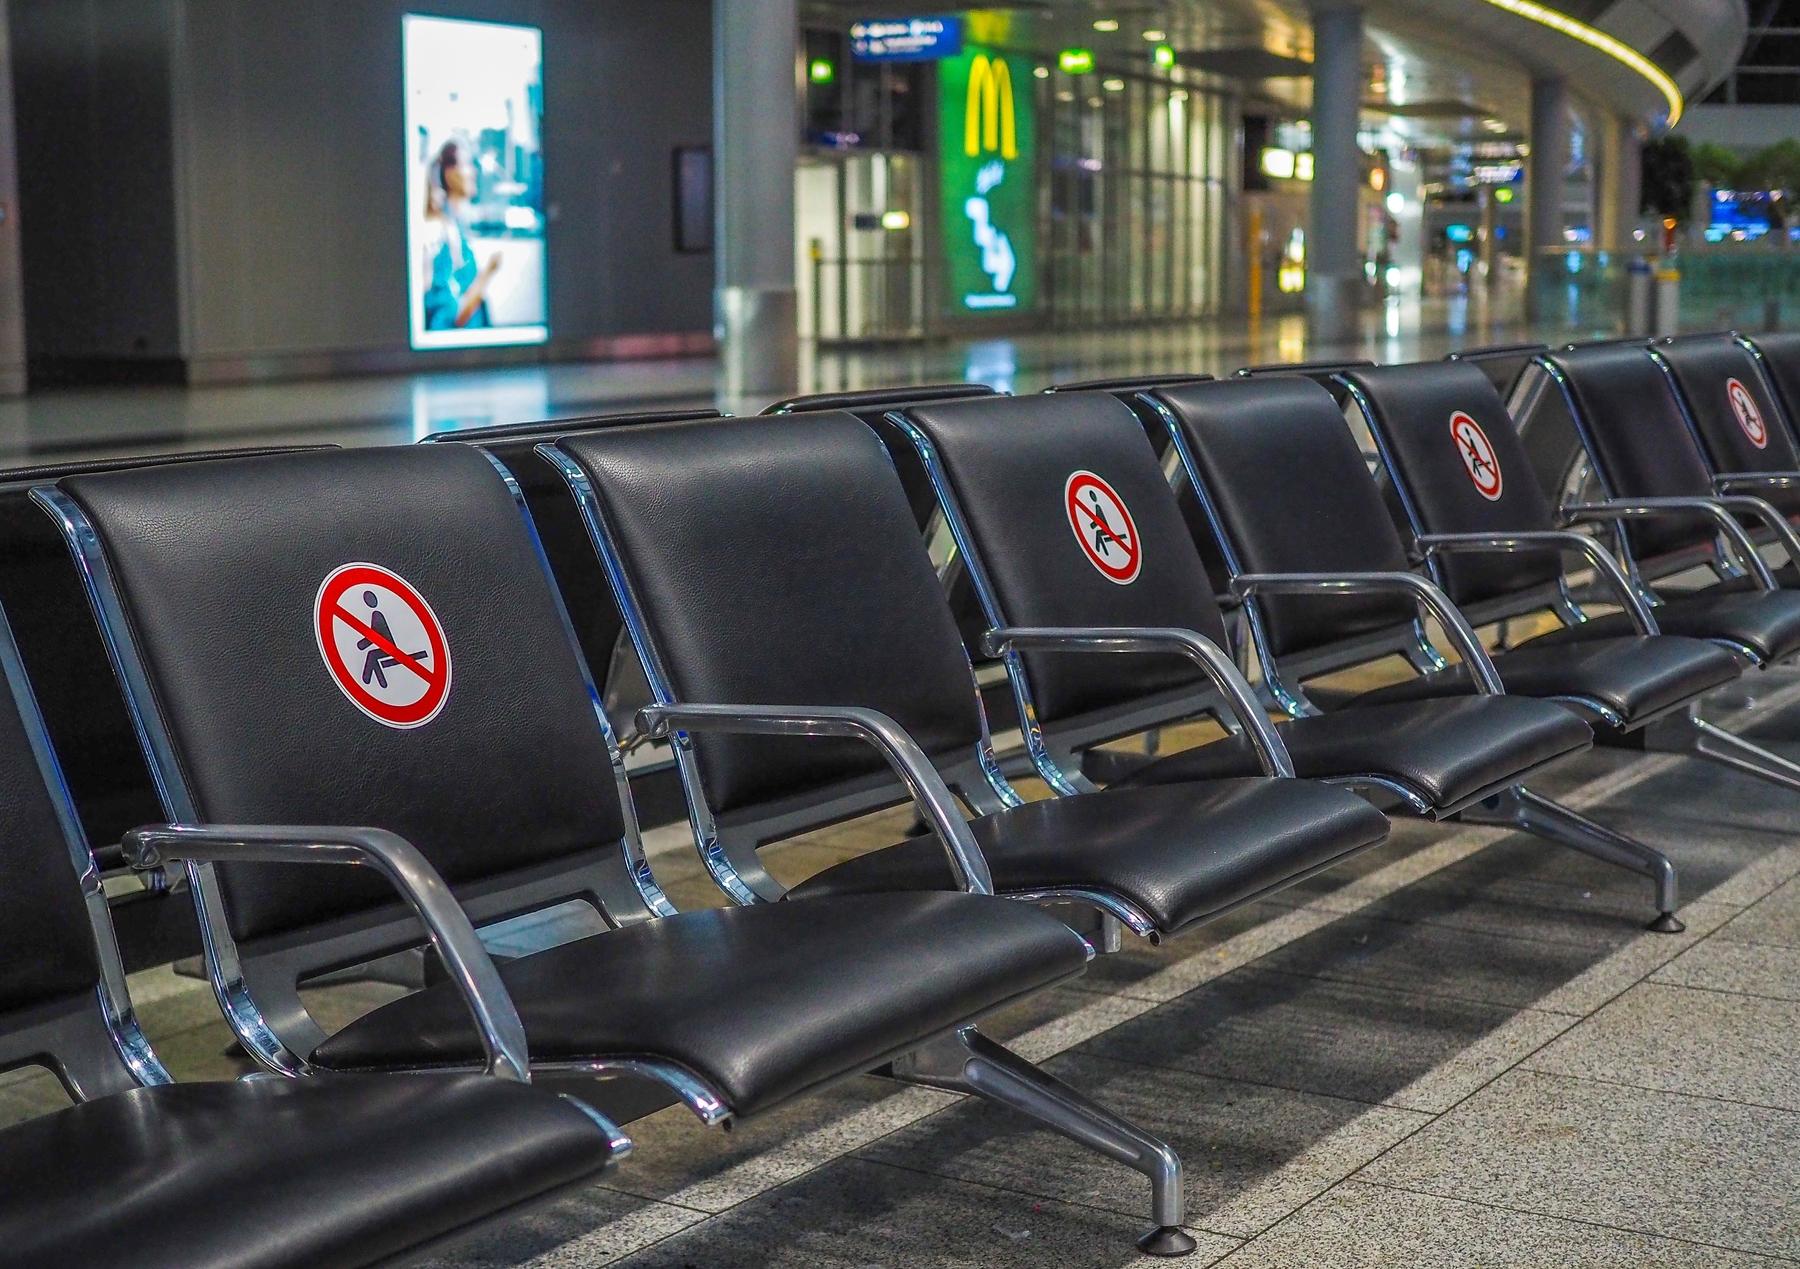 seating at the airport during coronavirus